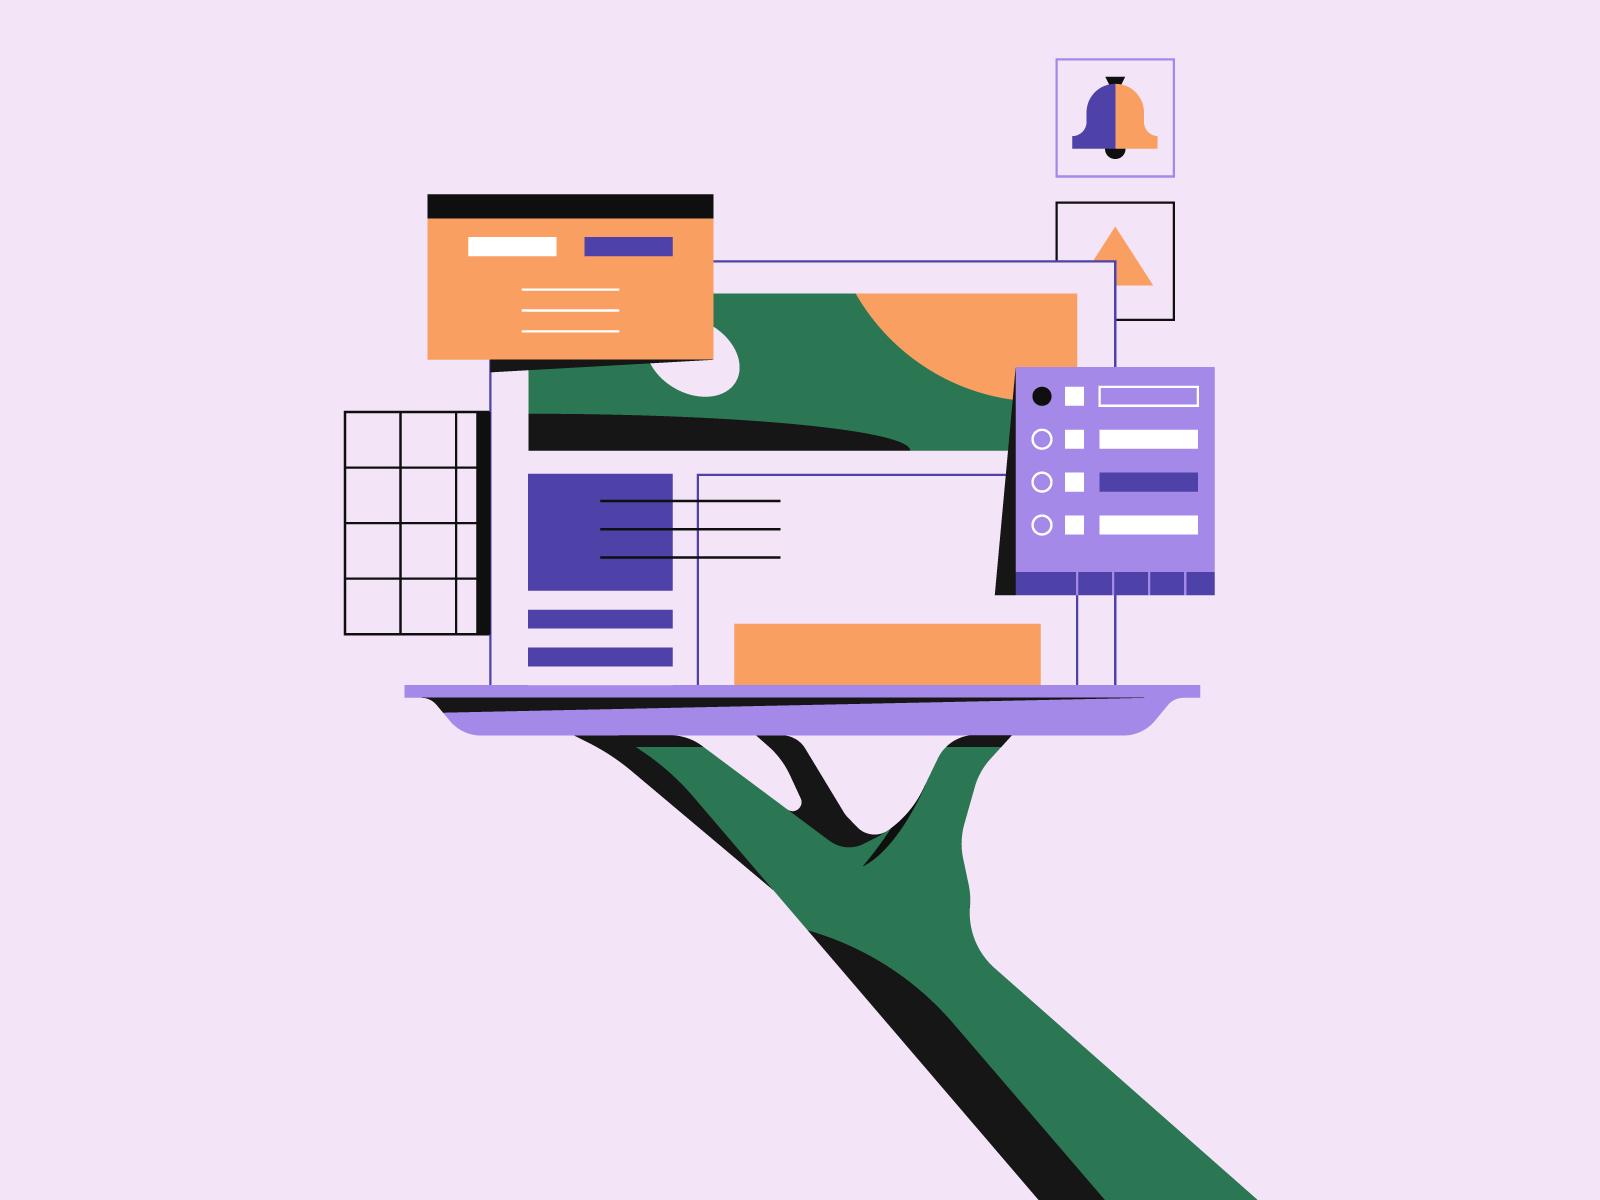 Serving Up Software by Tristan Kromopawiro